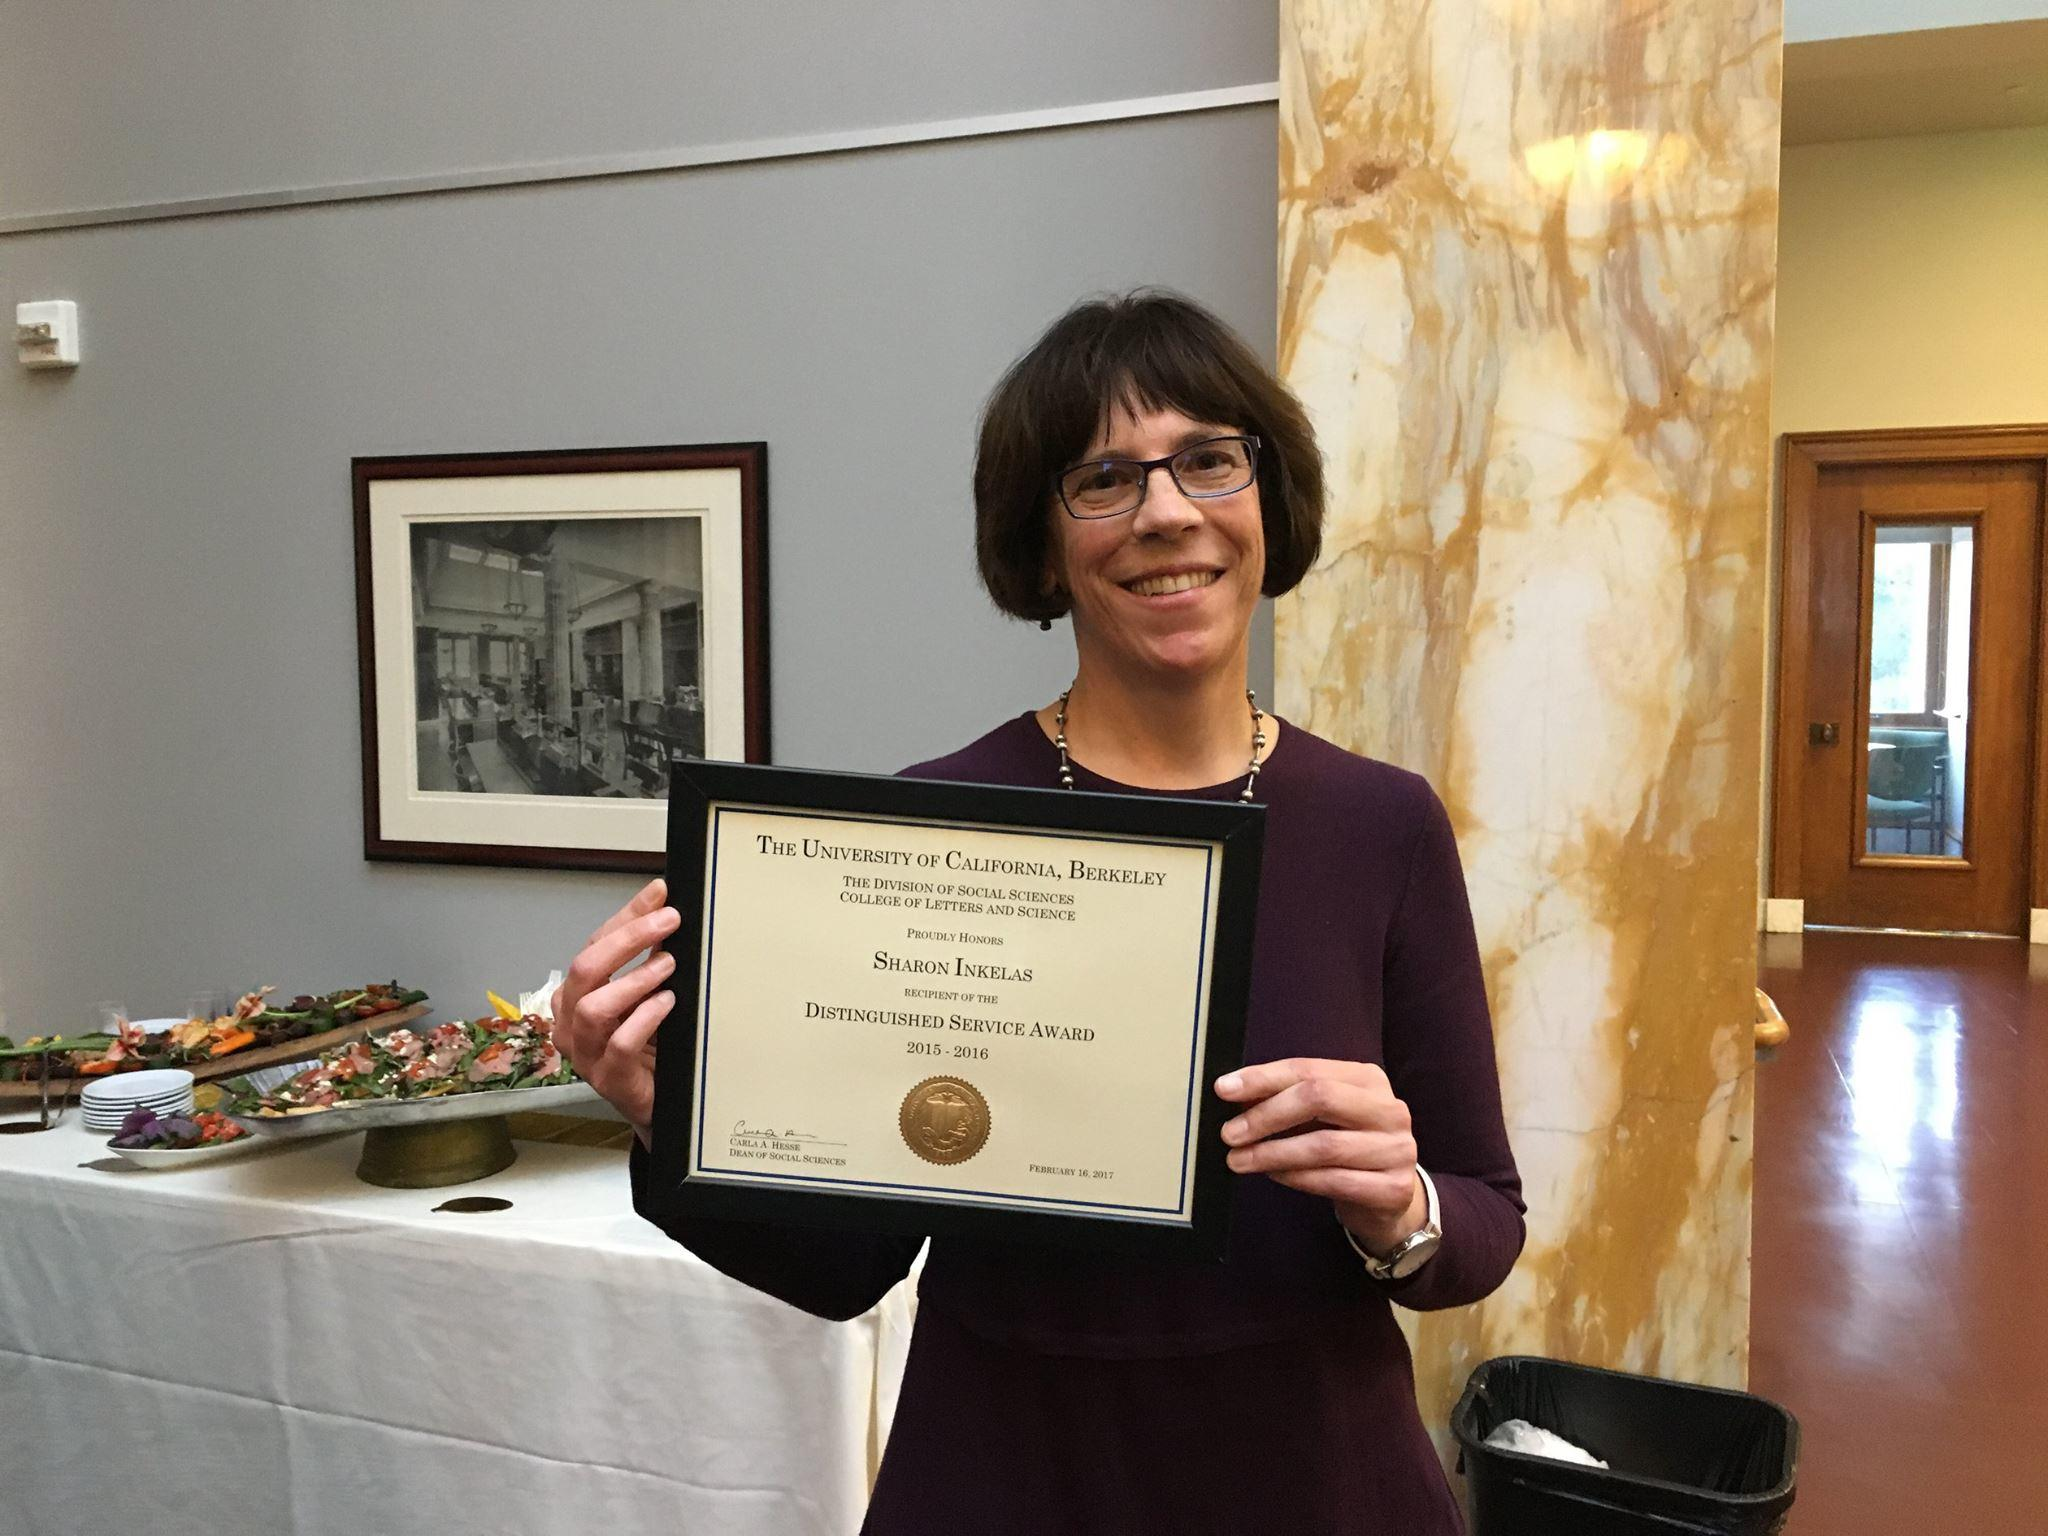 Sharon Inkelas, Social Sciences Distinguished Service Award